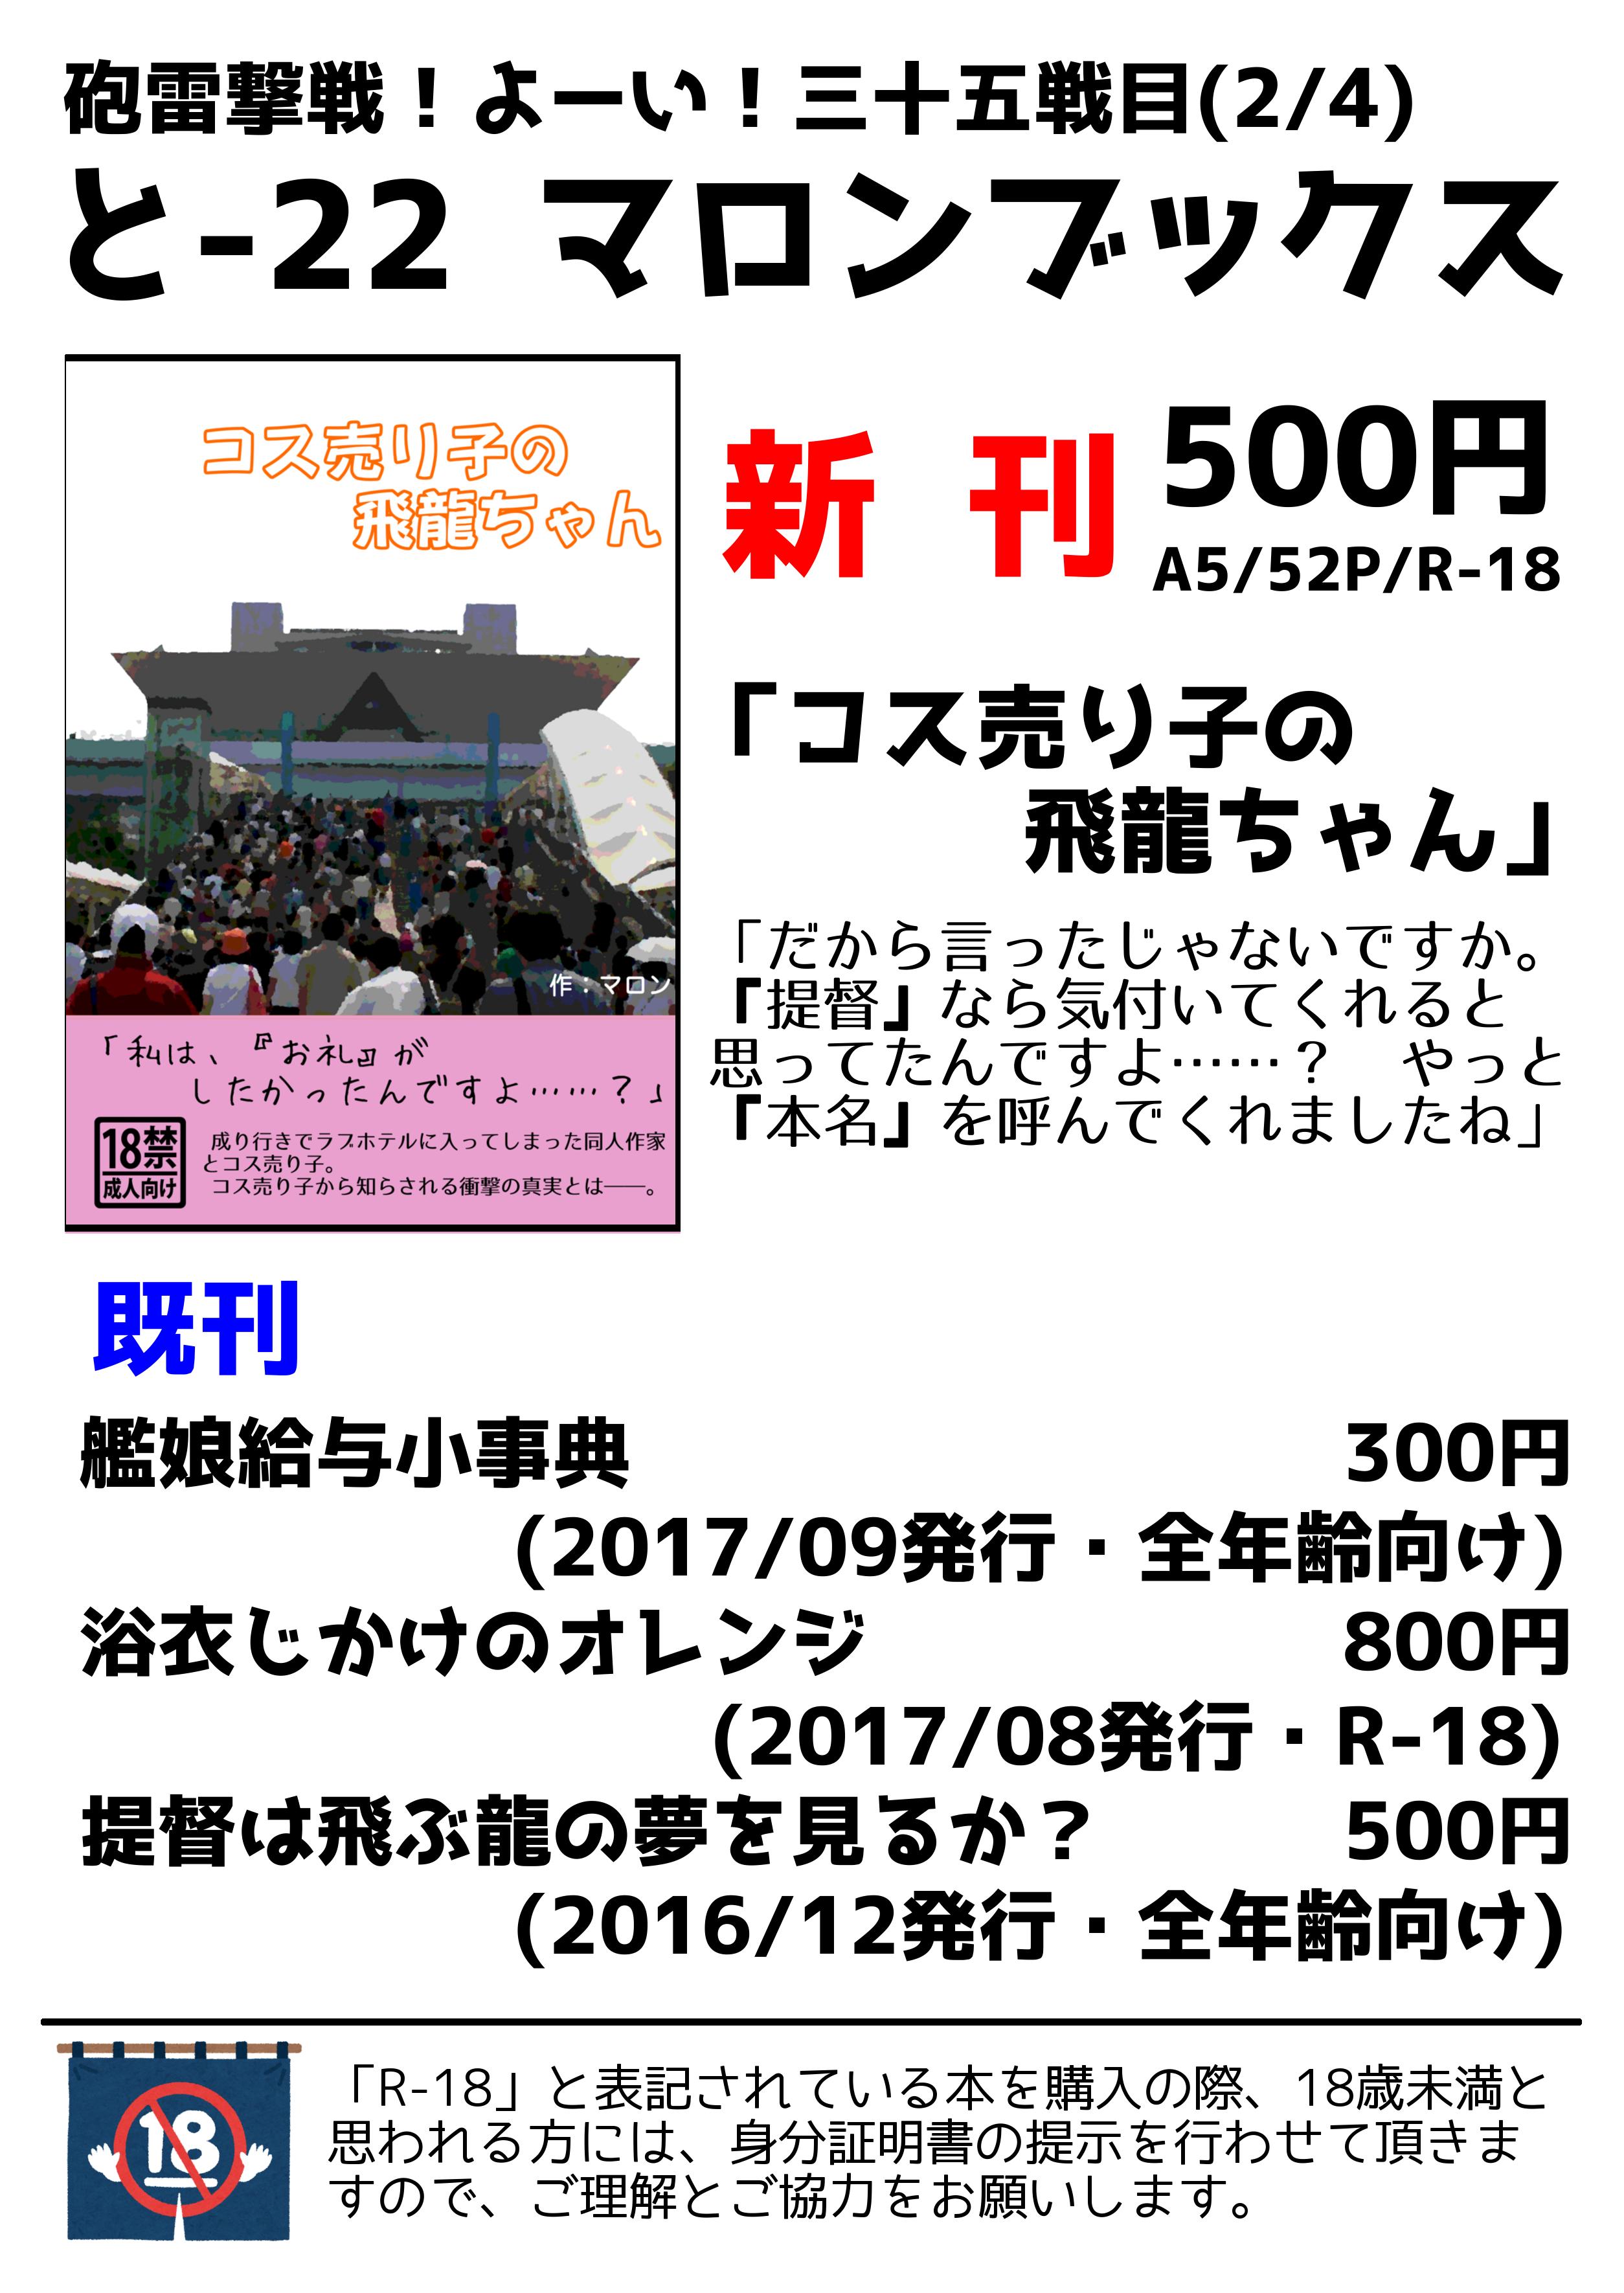 horai35_oshinagaki.png